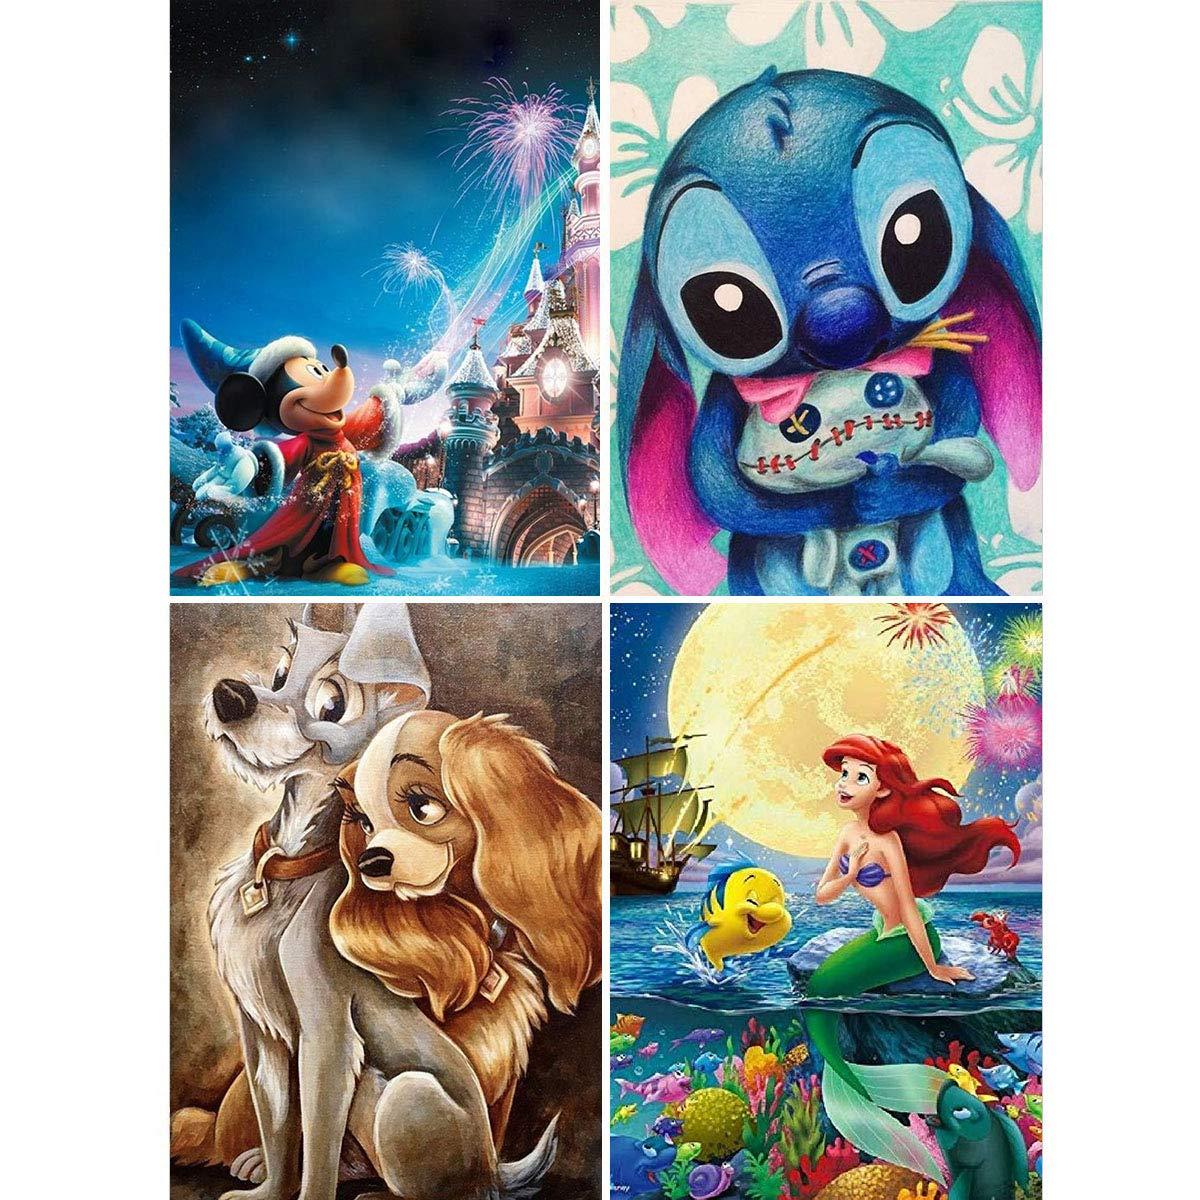 4 Pinturas por Diamantes Kit Completo Disney - 8G8SFK9W